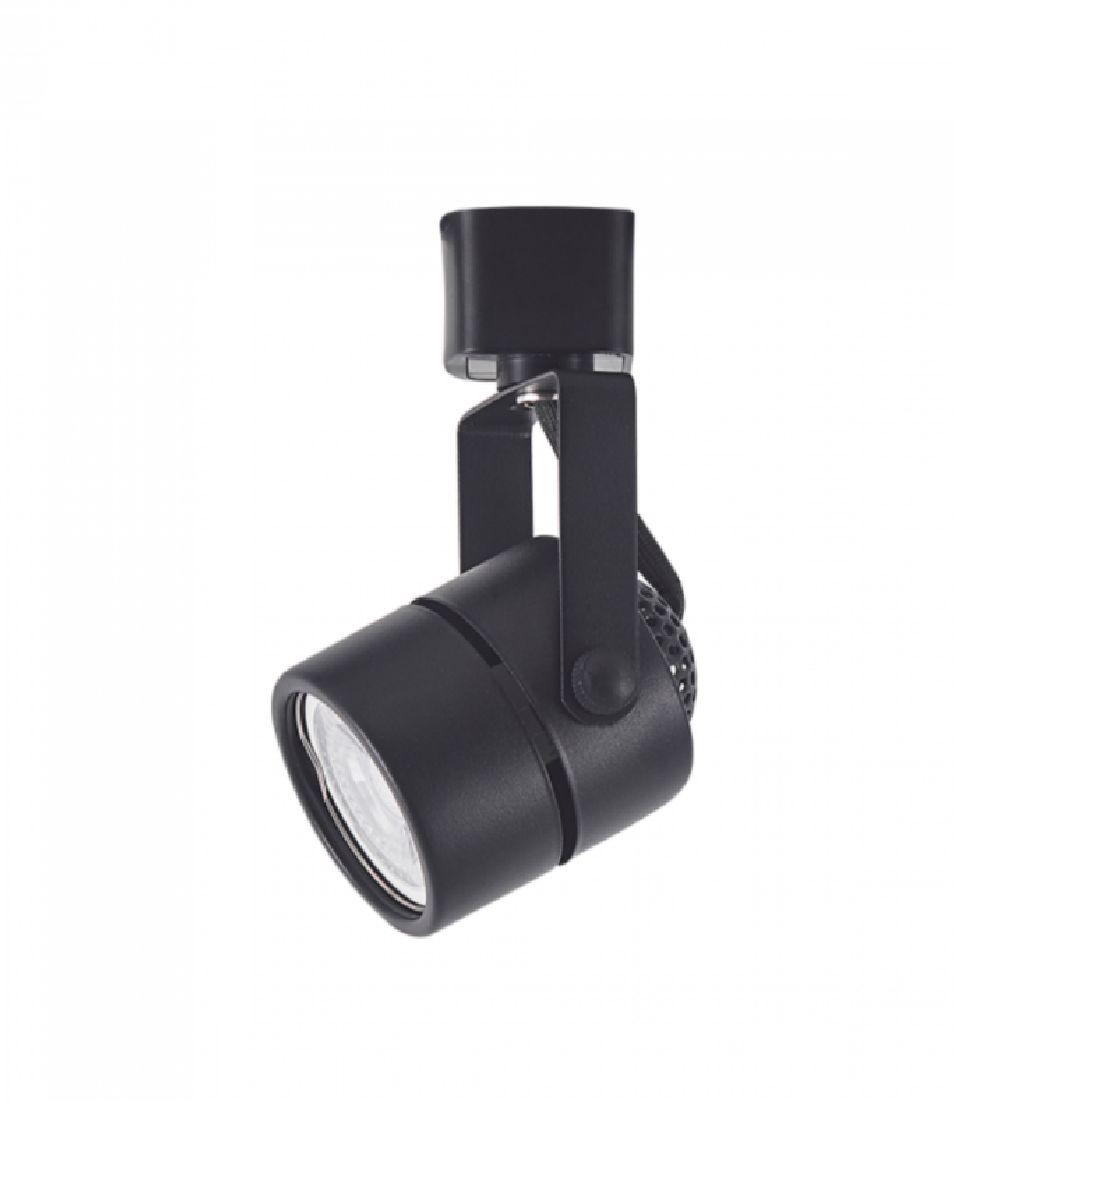 Kit Trilho Eletrificado 1,5m Preto Nordecor + 4 Spot Redondo MR16 / GU10